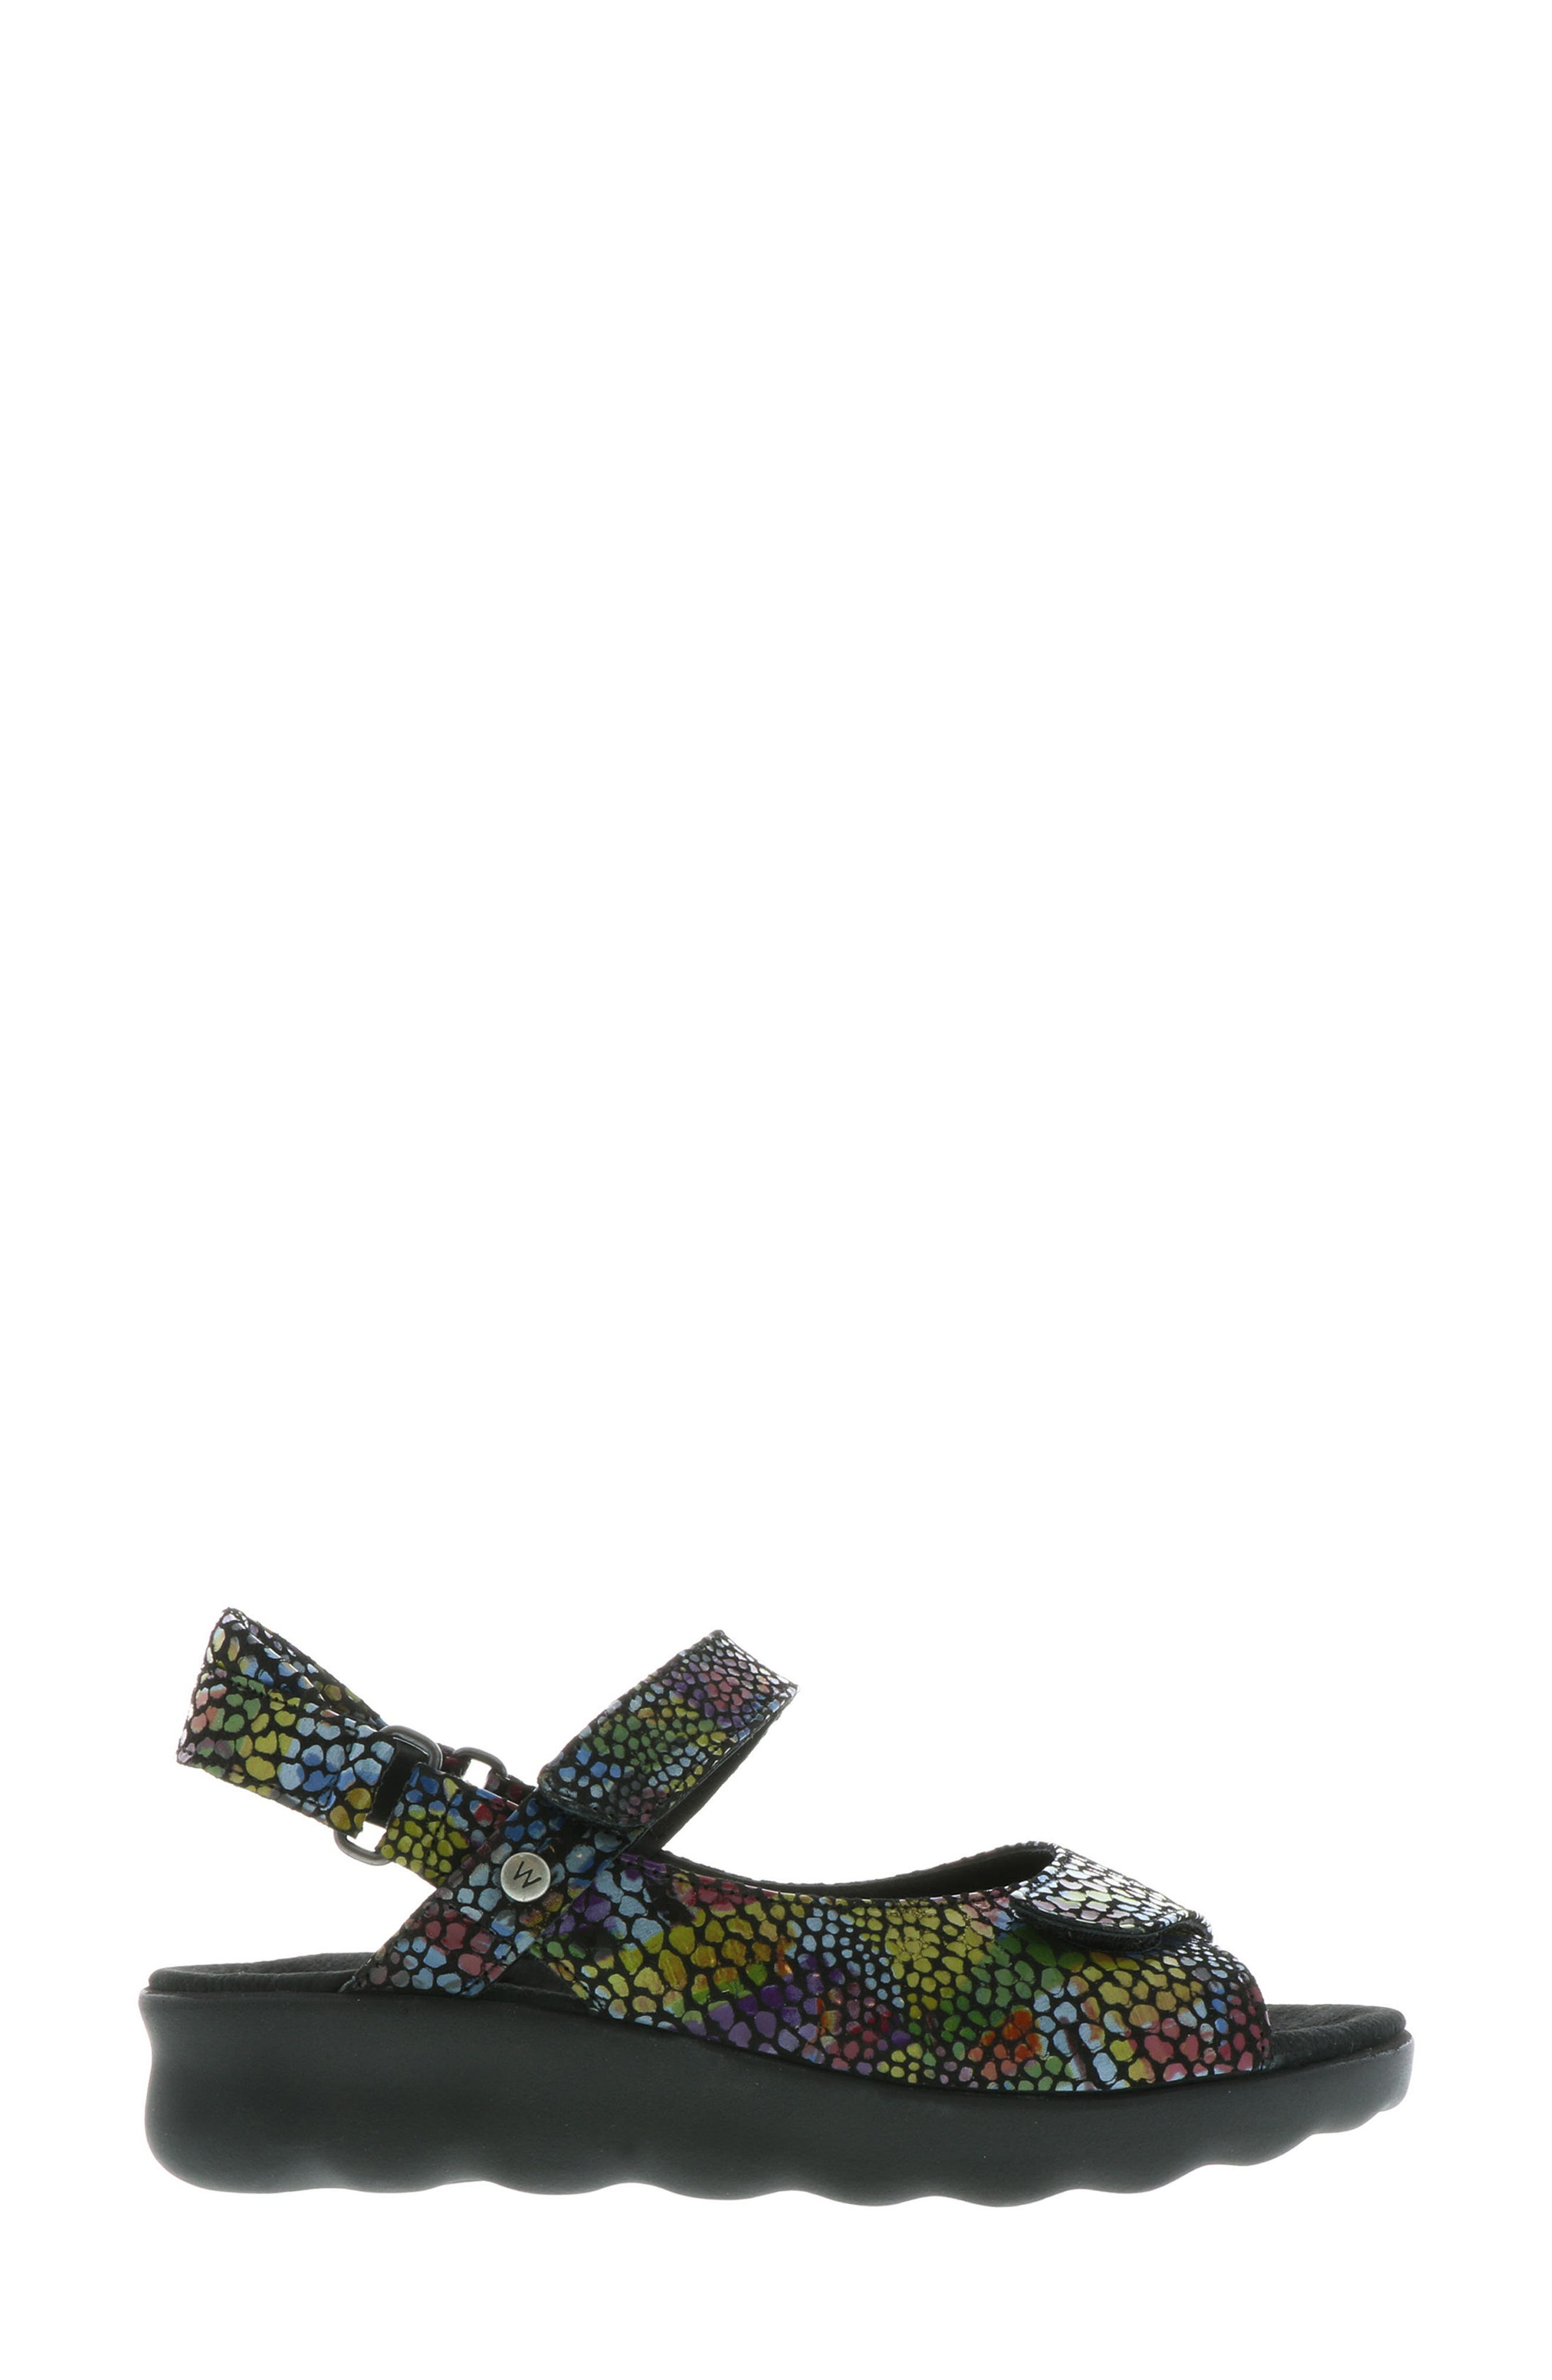 Pichu Quarter Strap Sandal,                             Alternate thumbnail 3, color,                             Black Multi Color Fantasy